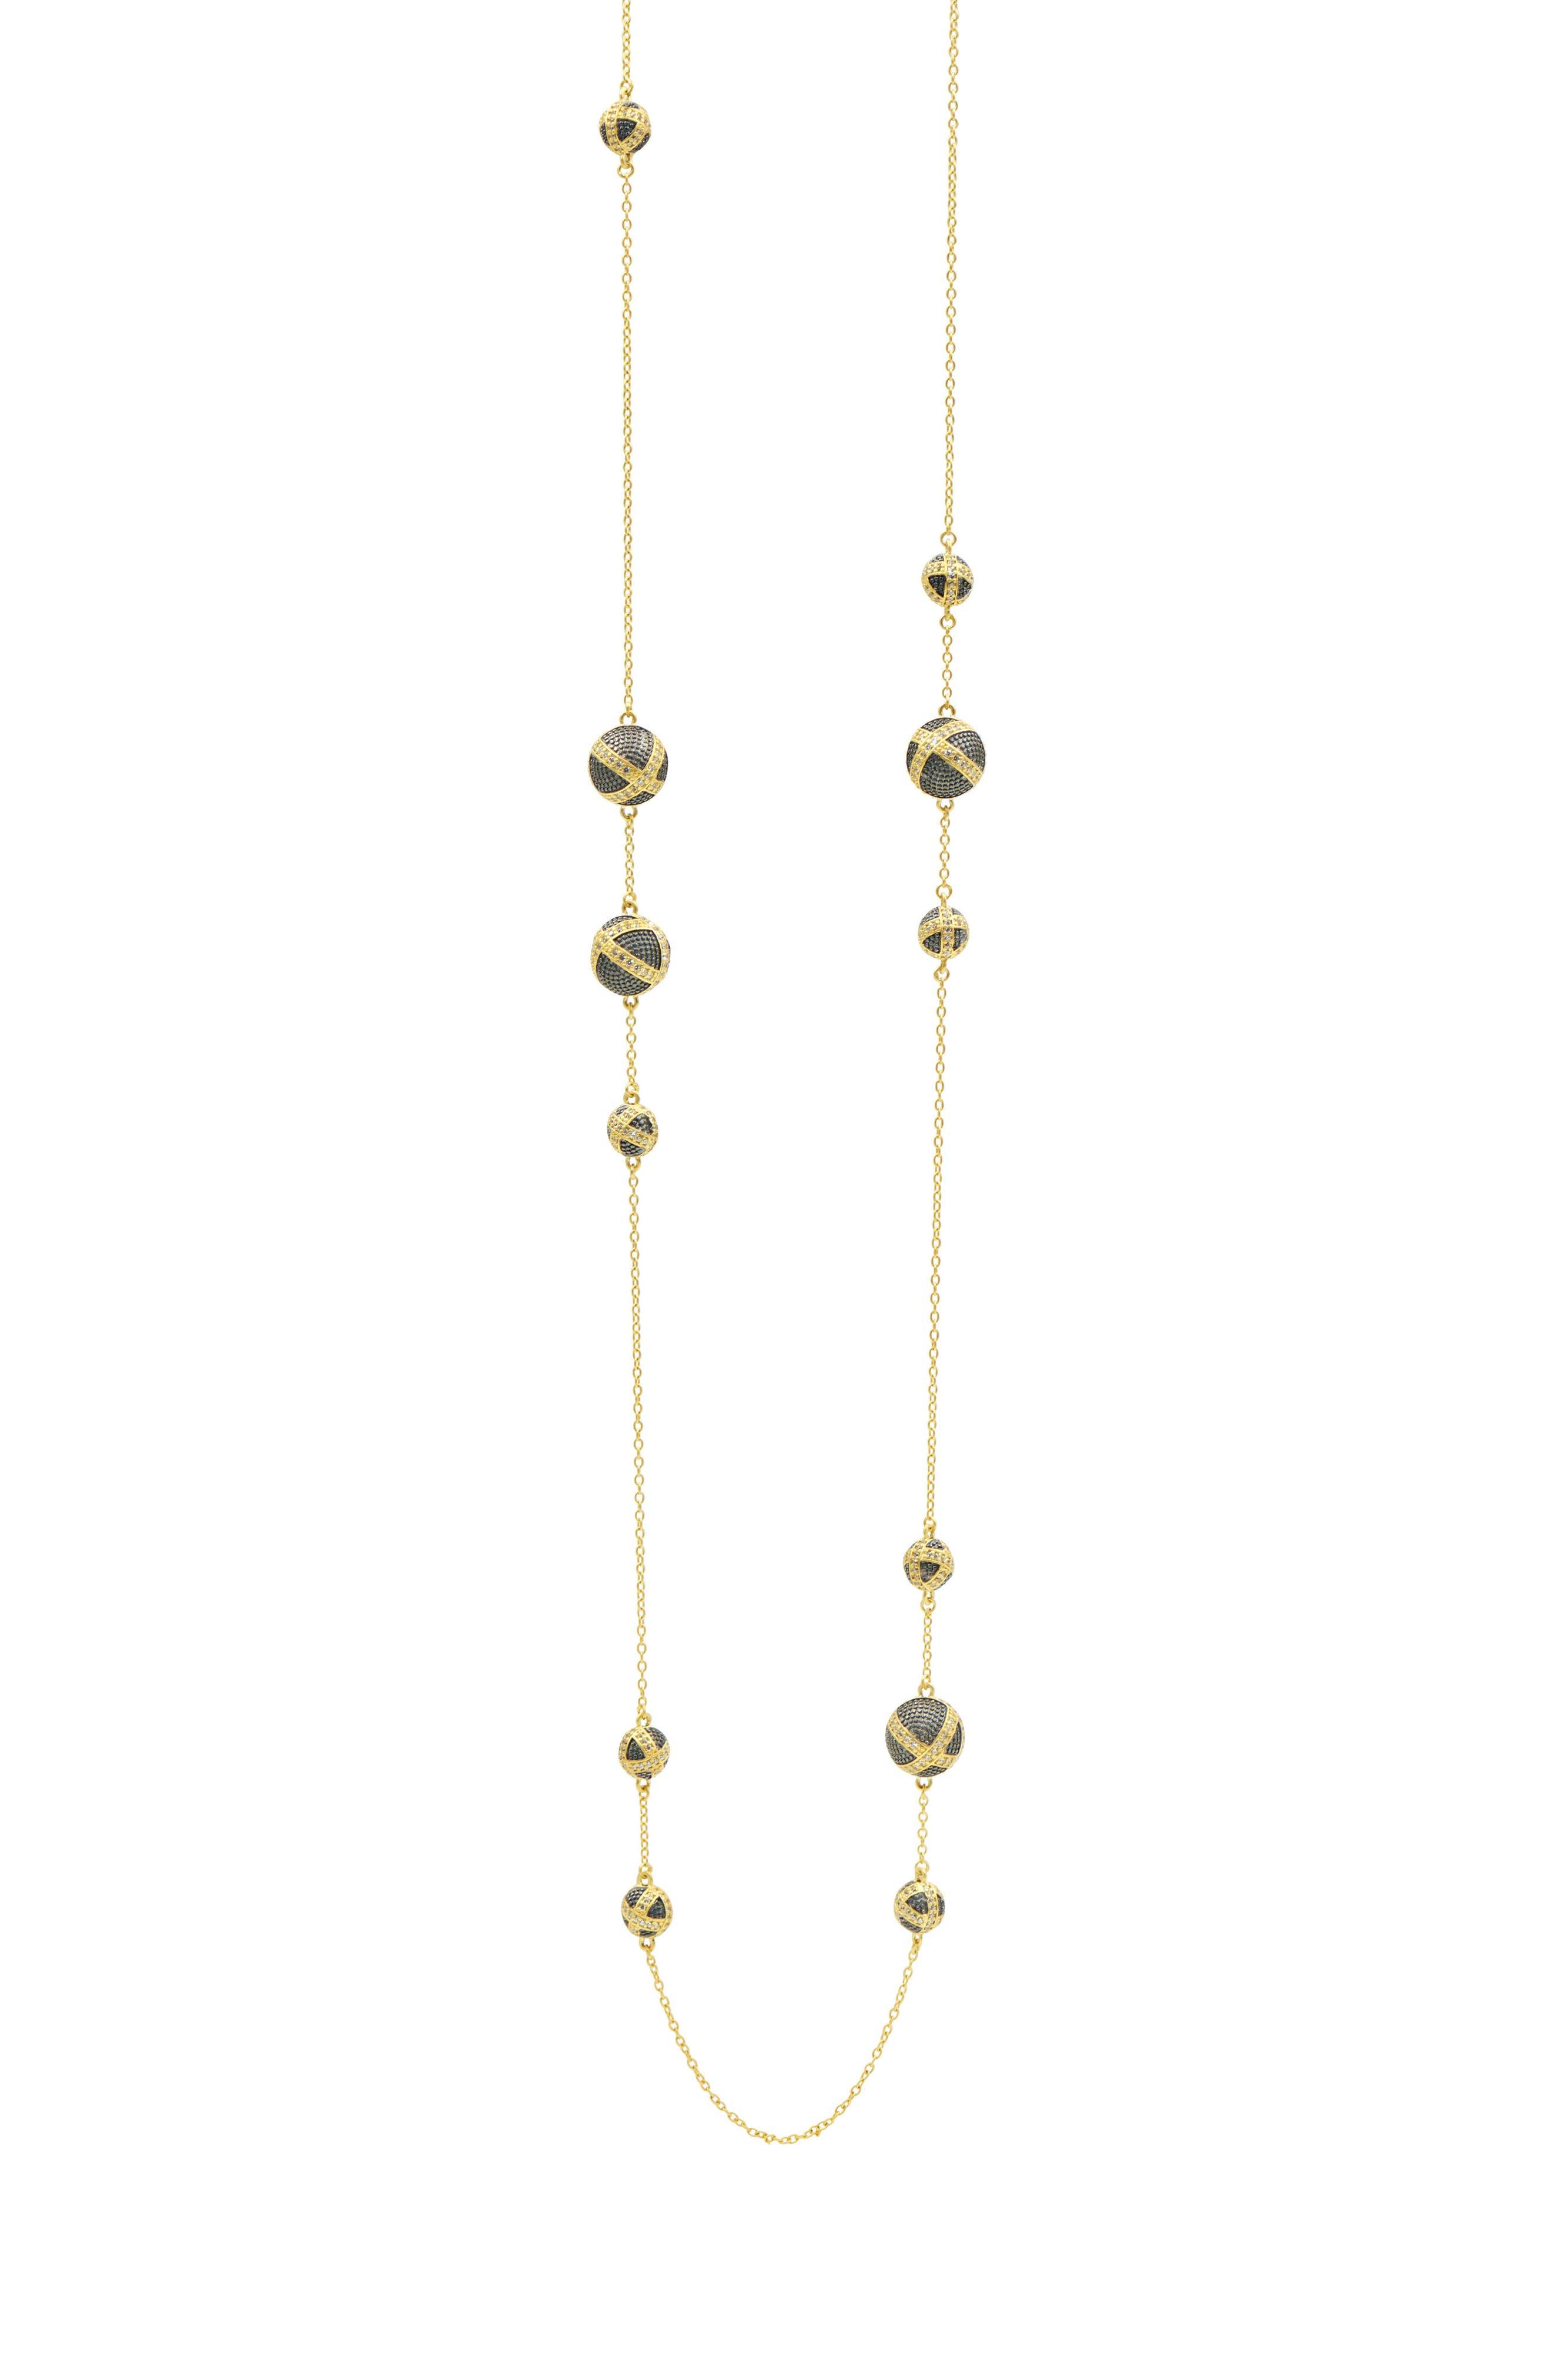 FREIDA ROTHMAN Textured Ornaments Station Necklace